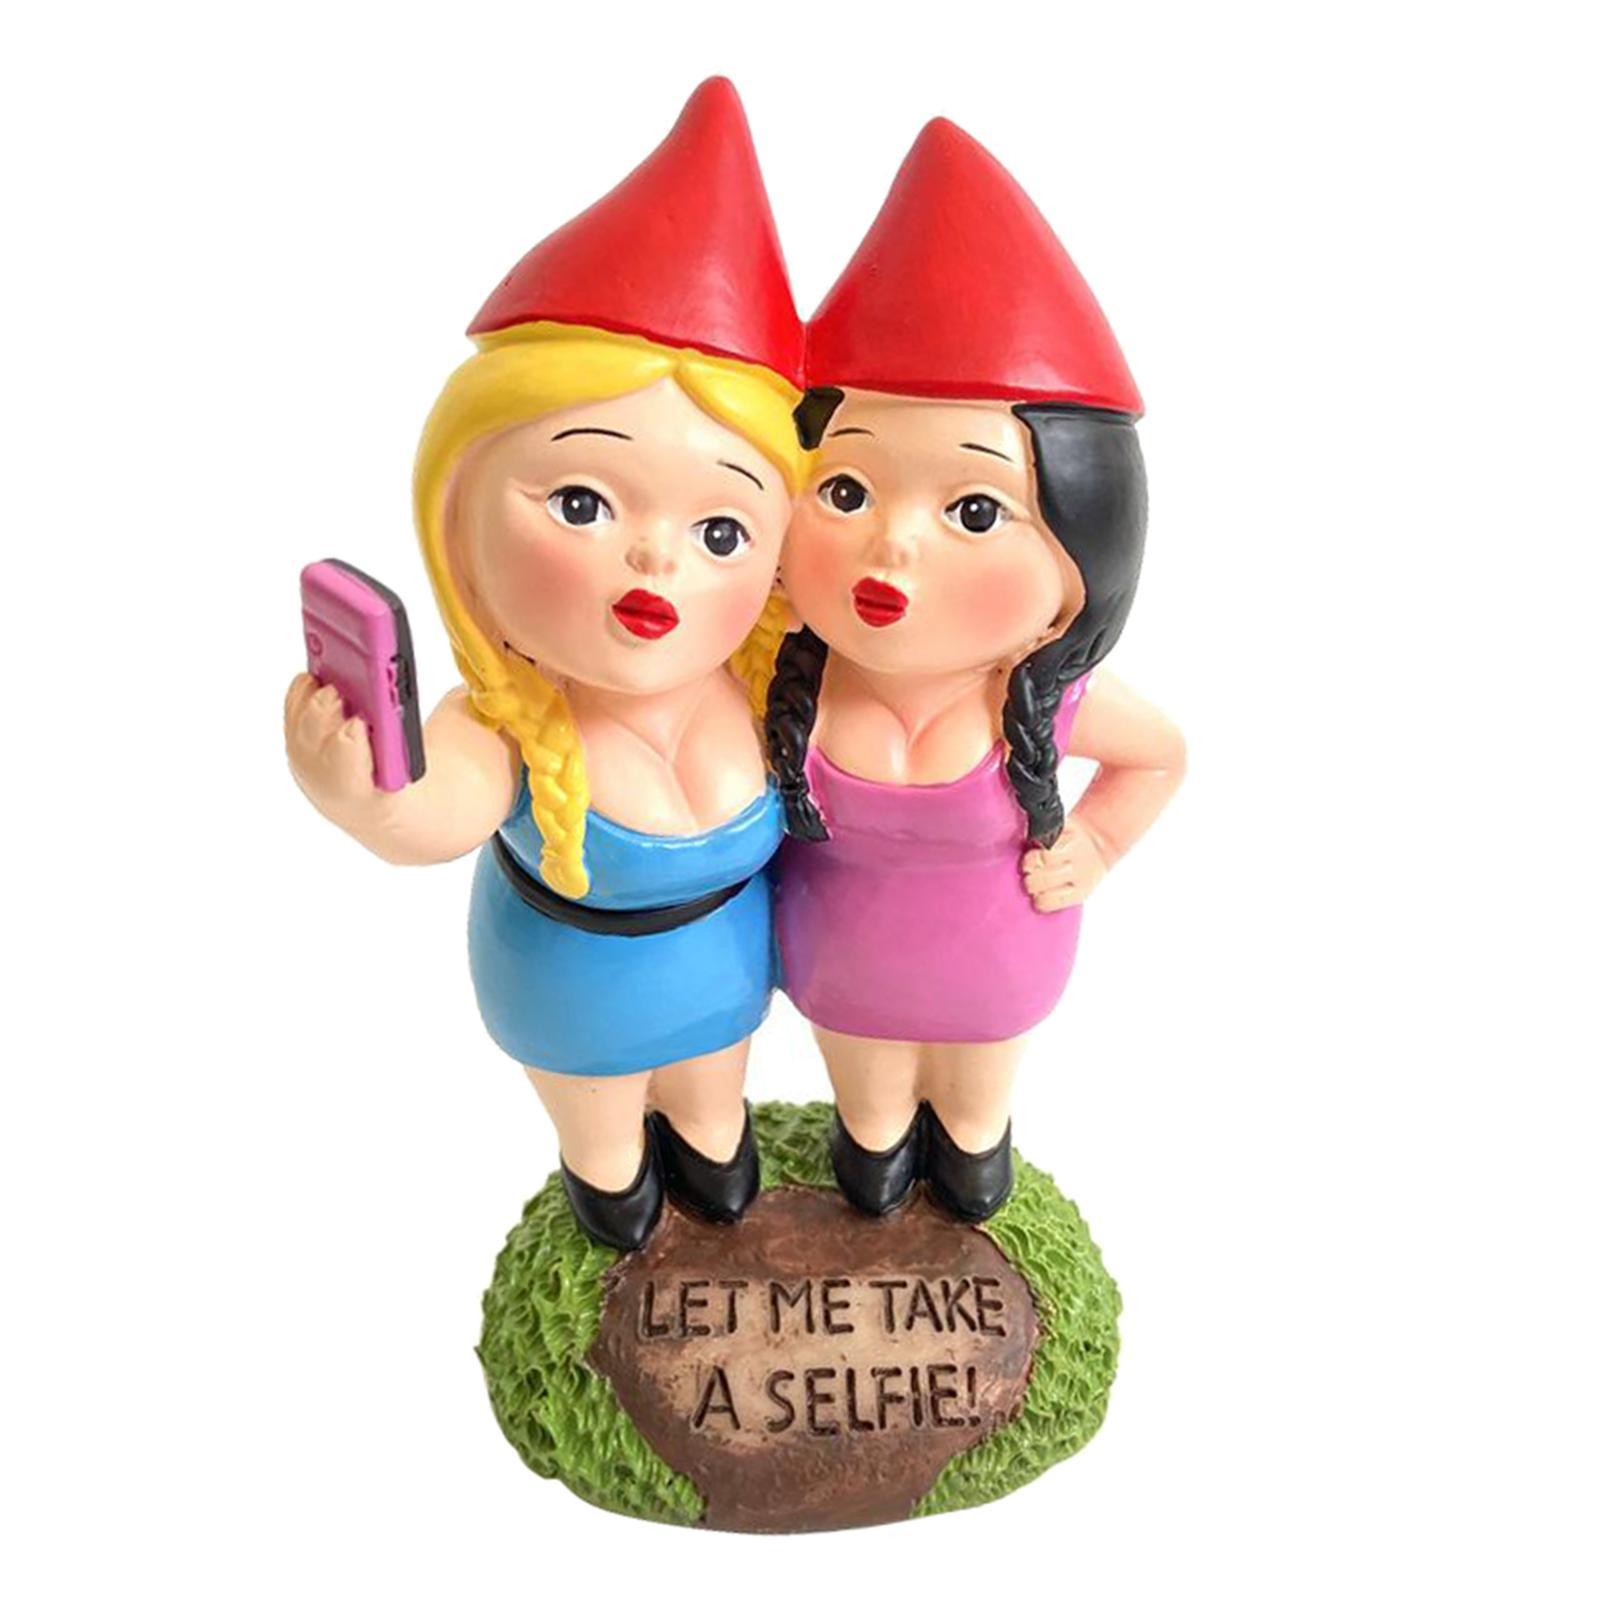 thumbnail 16 - Funny Resin Naughty Garden Gnome Statue Ornaments Villa Home Figurines Decor AU